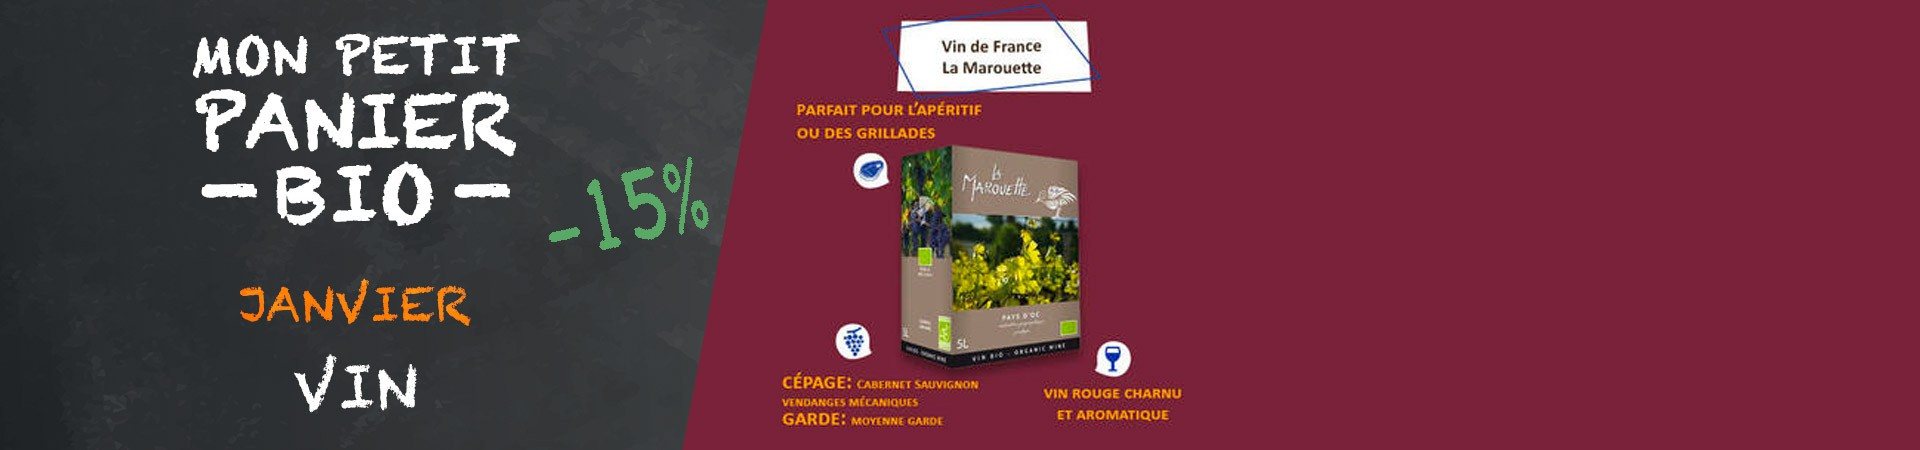 Vin de France la Marouette